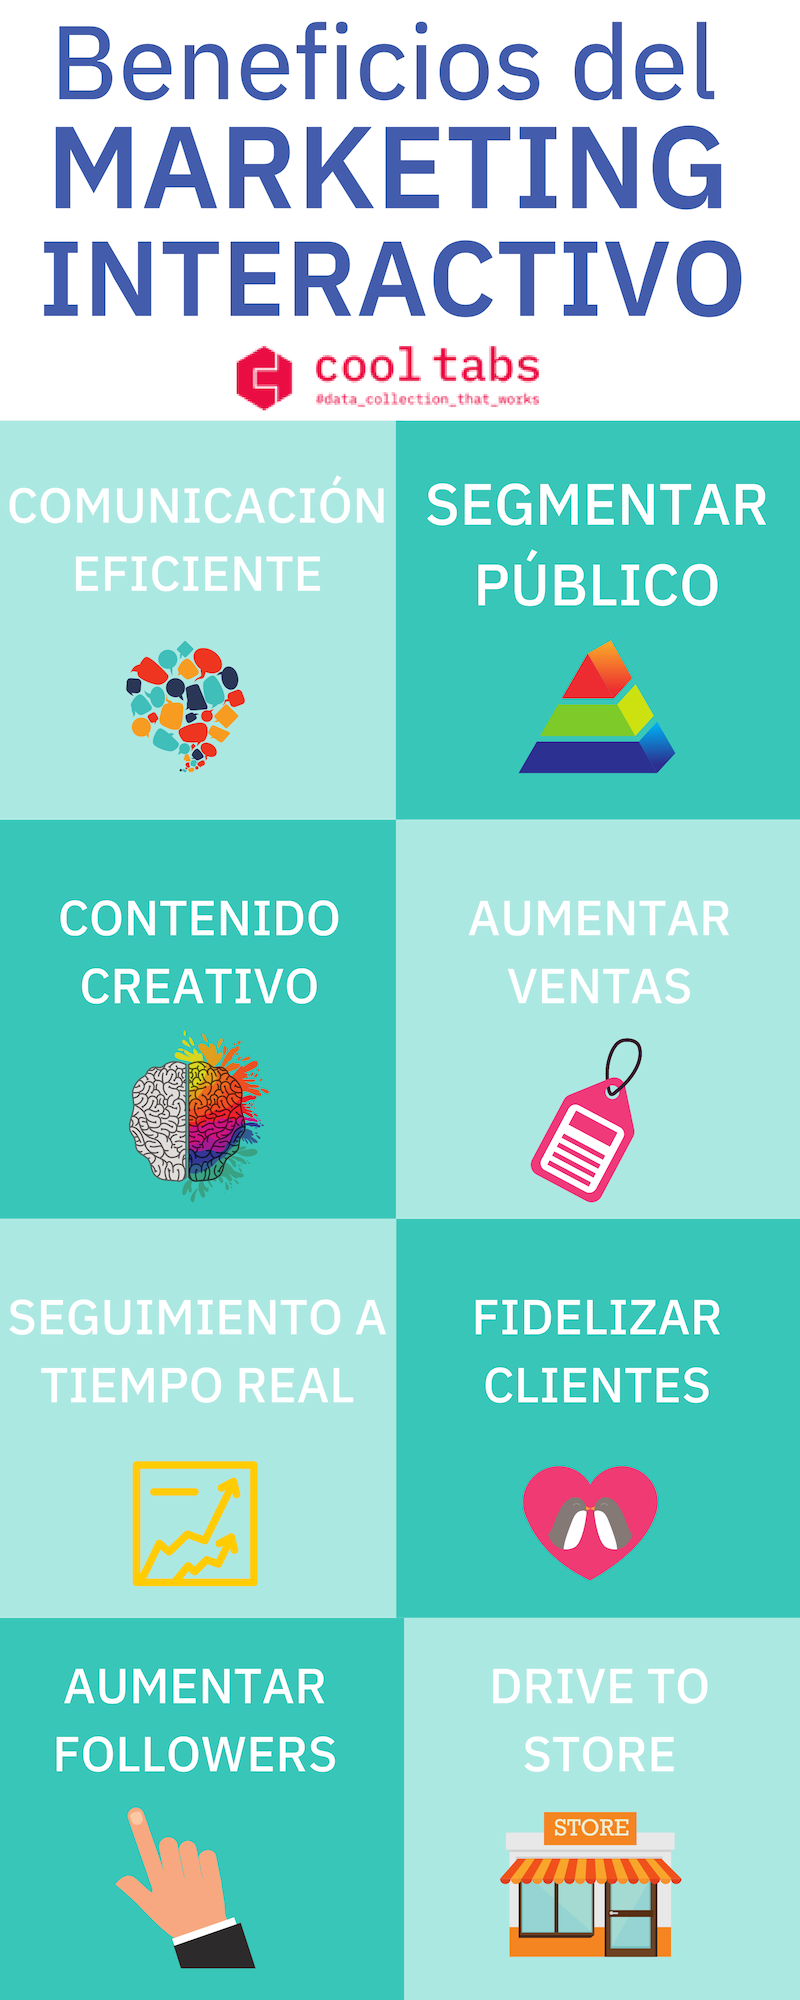 marketing-interactivo-infografía